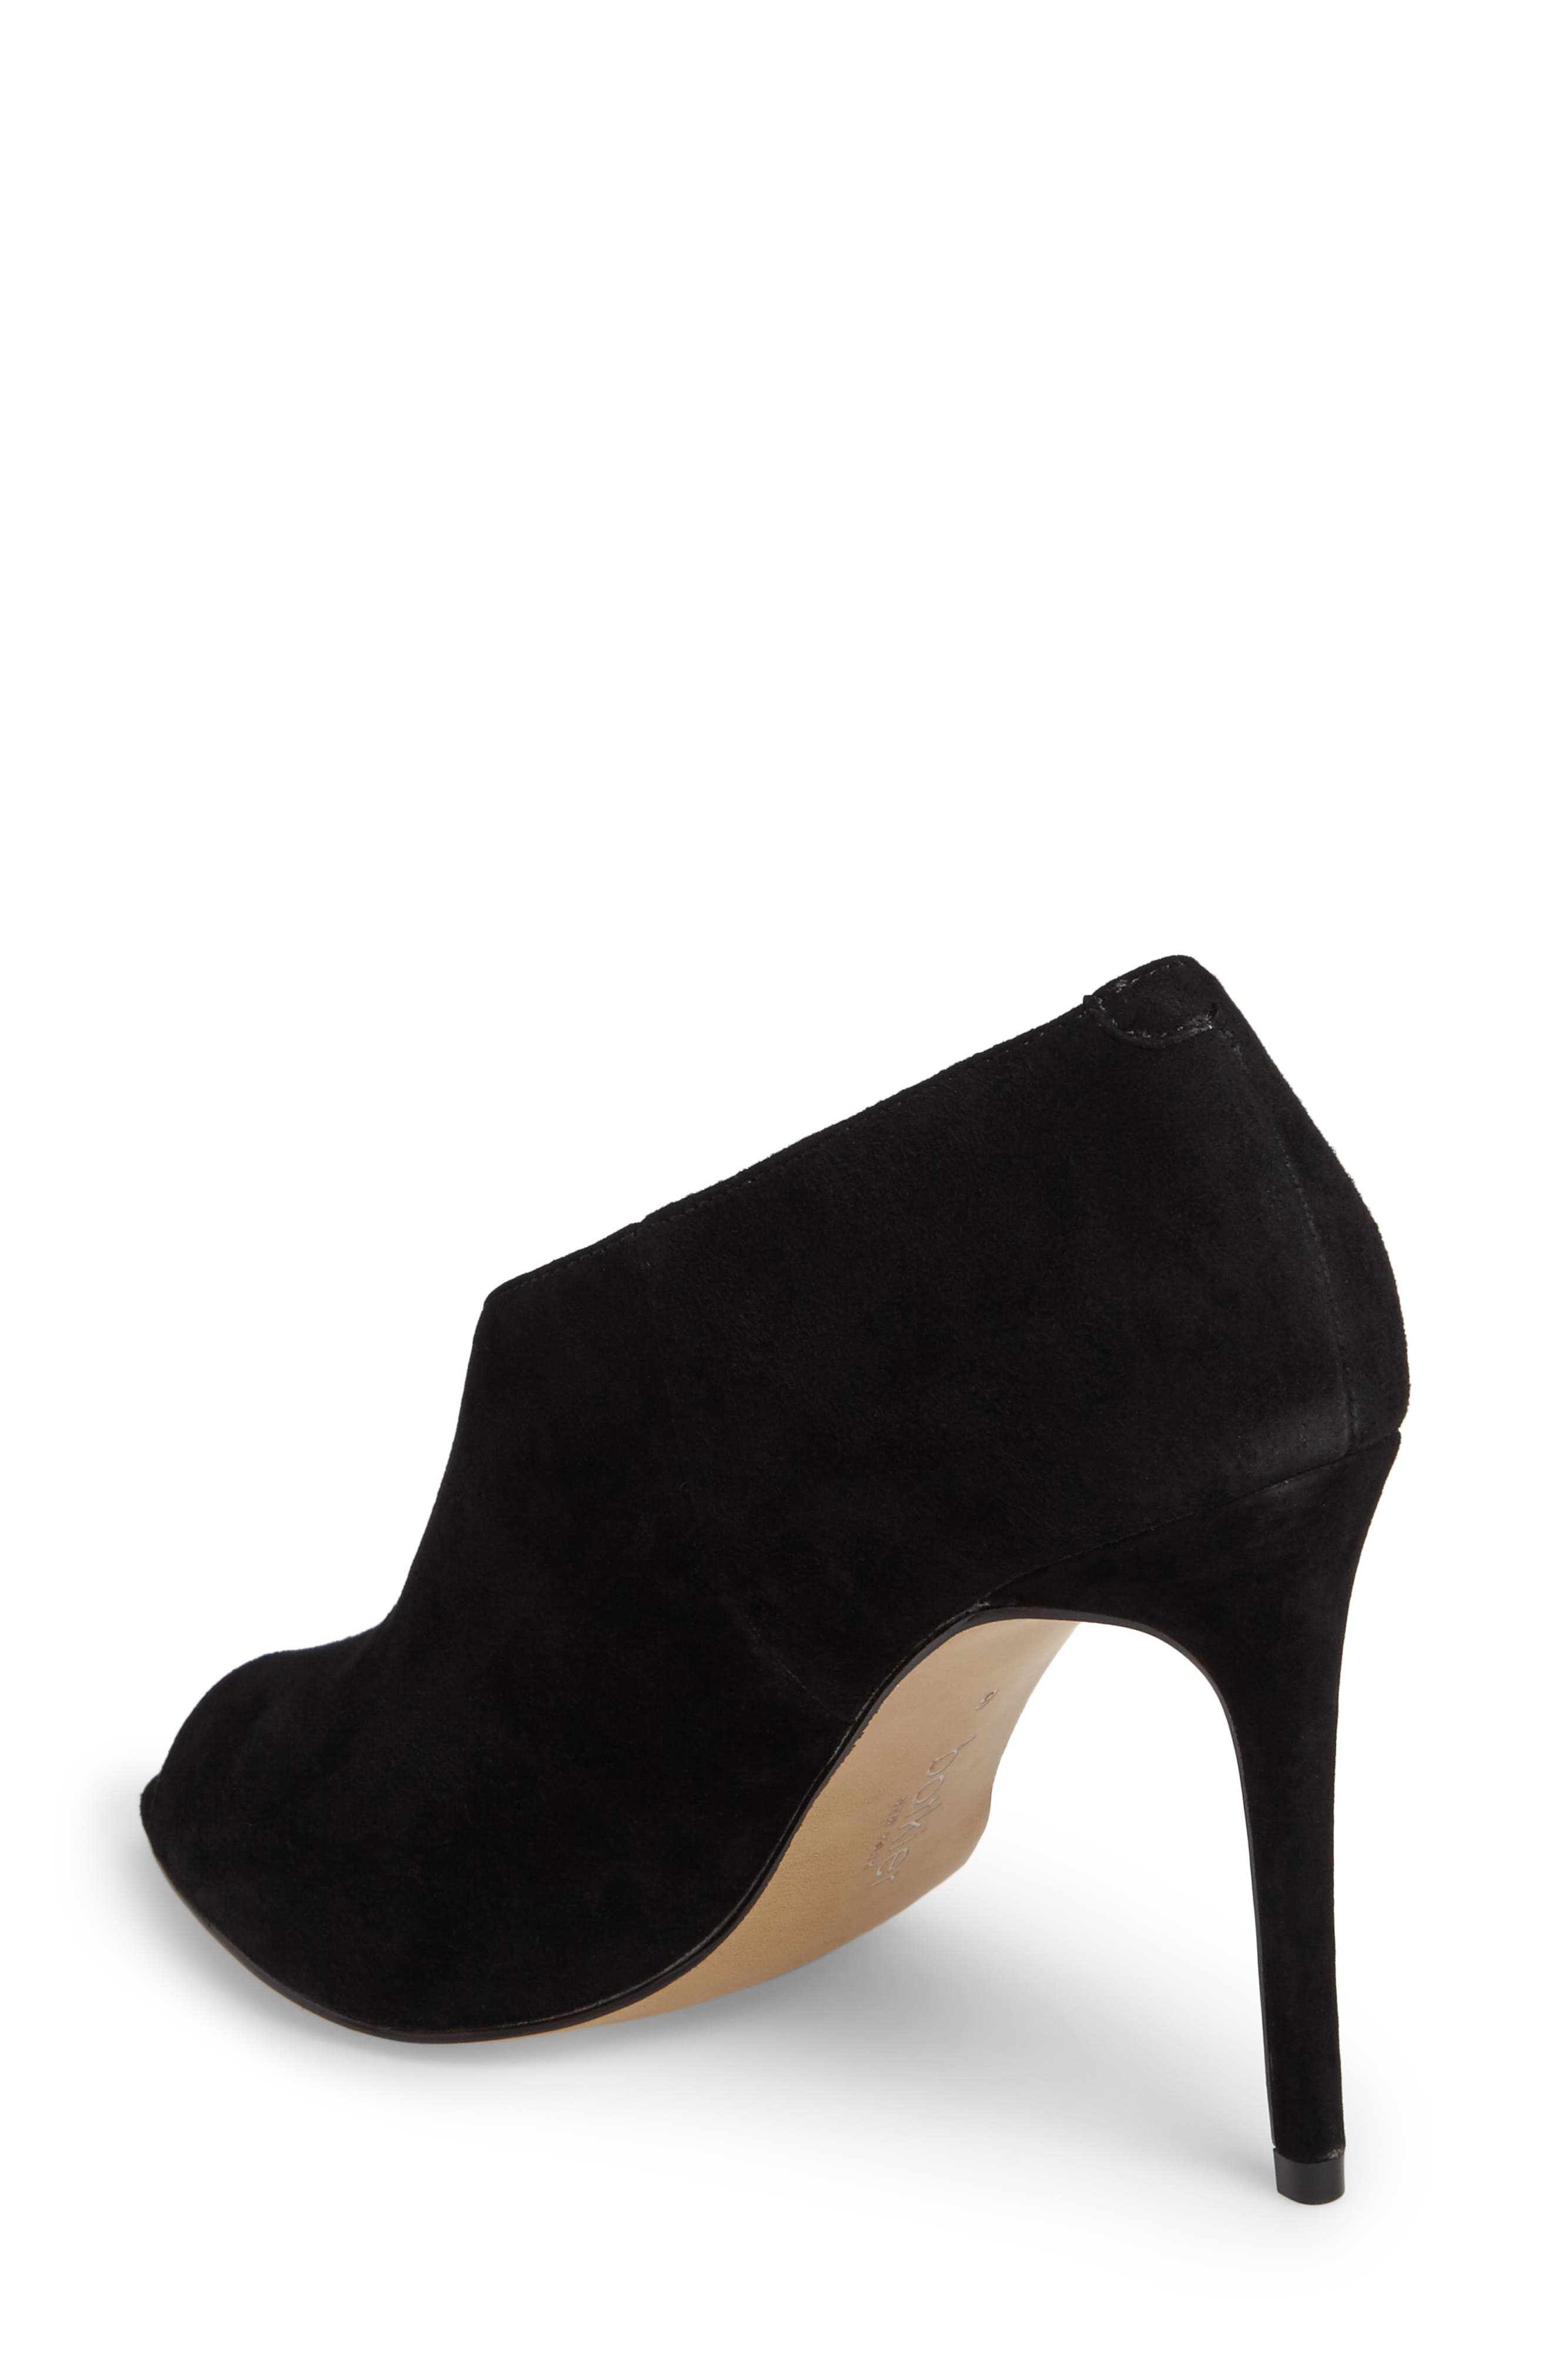 Adelia Asymmetrical Sandal,                             Alternate thumbnail 2, color,                             BLACK